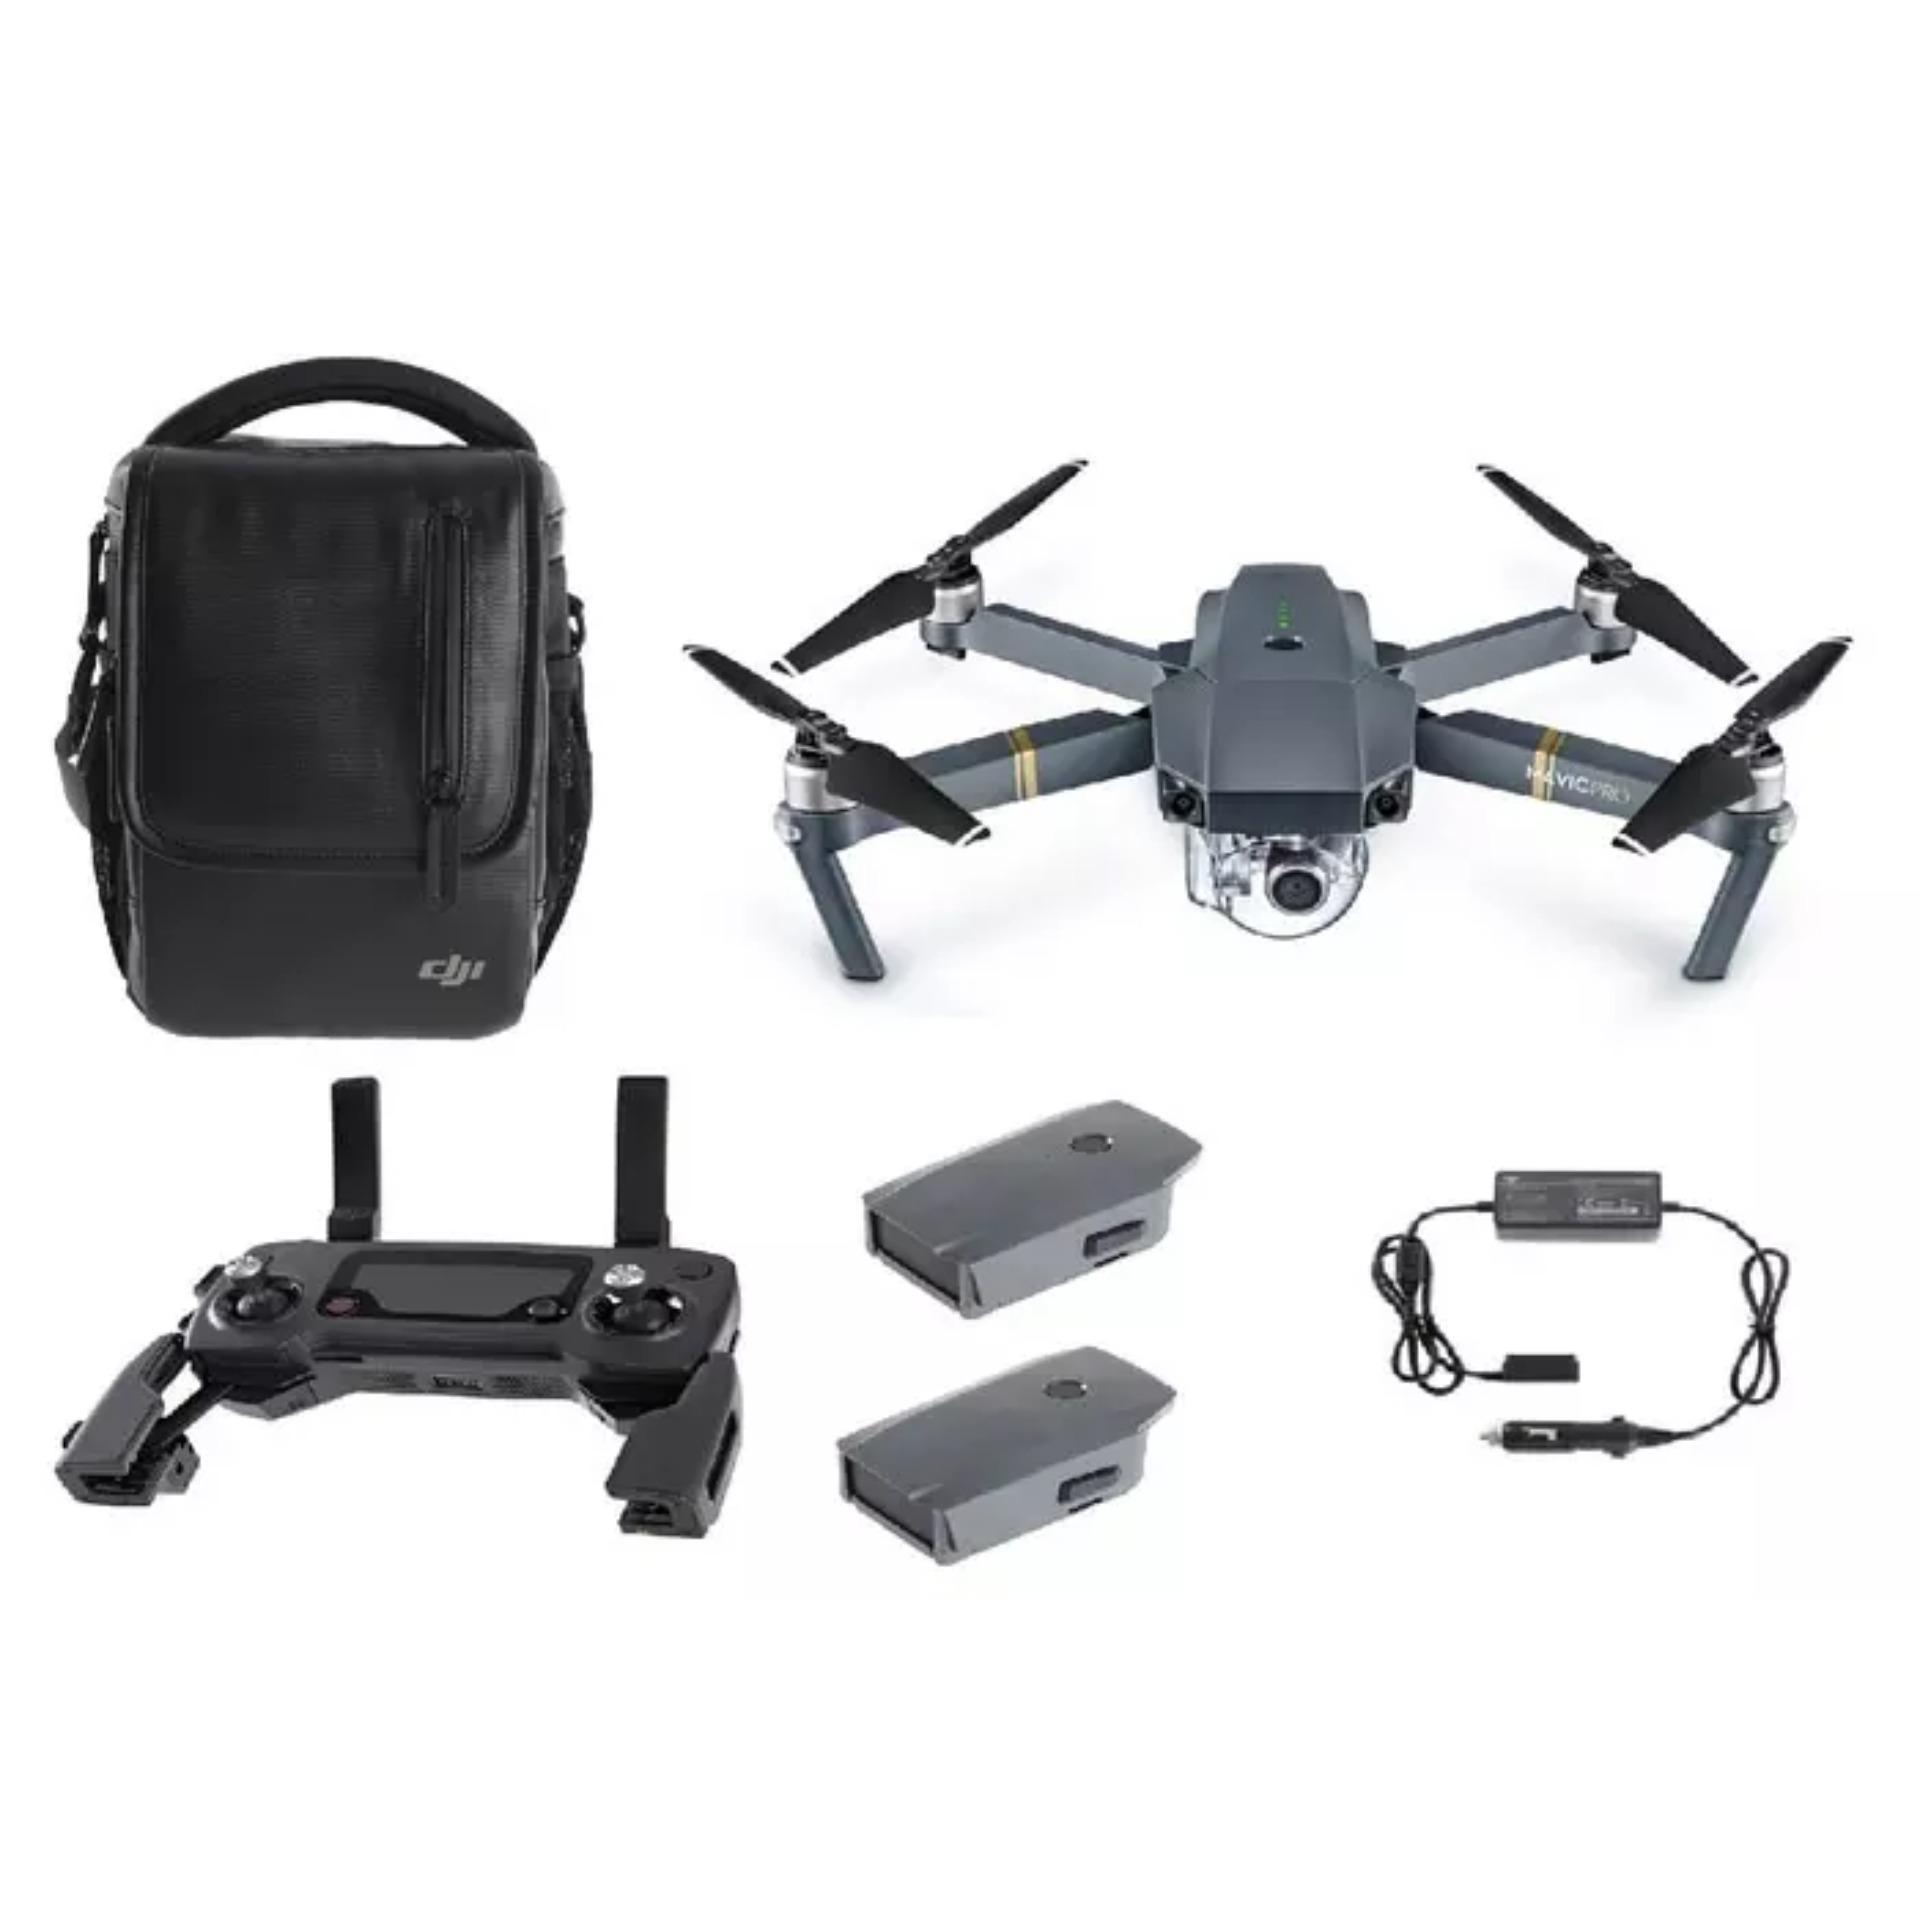 Perbandingan Harga Dji Mavic Pro Combo Drone Quadcopter Total 3 Fly More Battery Mavicpro